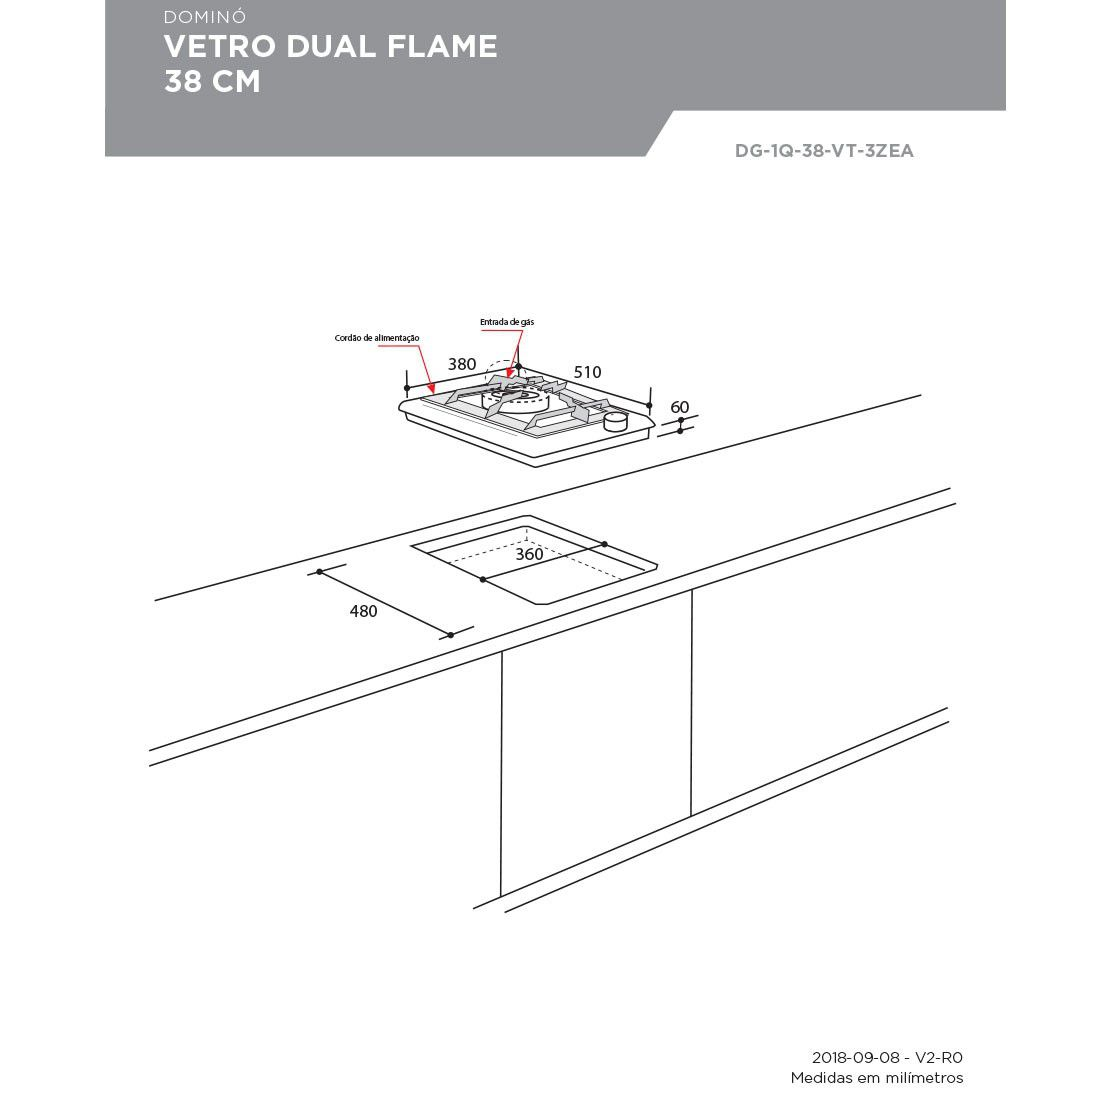 Dominó Elettromec  Vetro Dual Flame 1 Boca Inox 38cm Bivolt